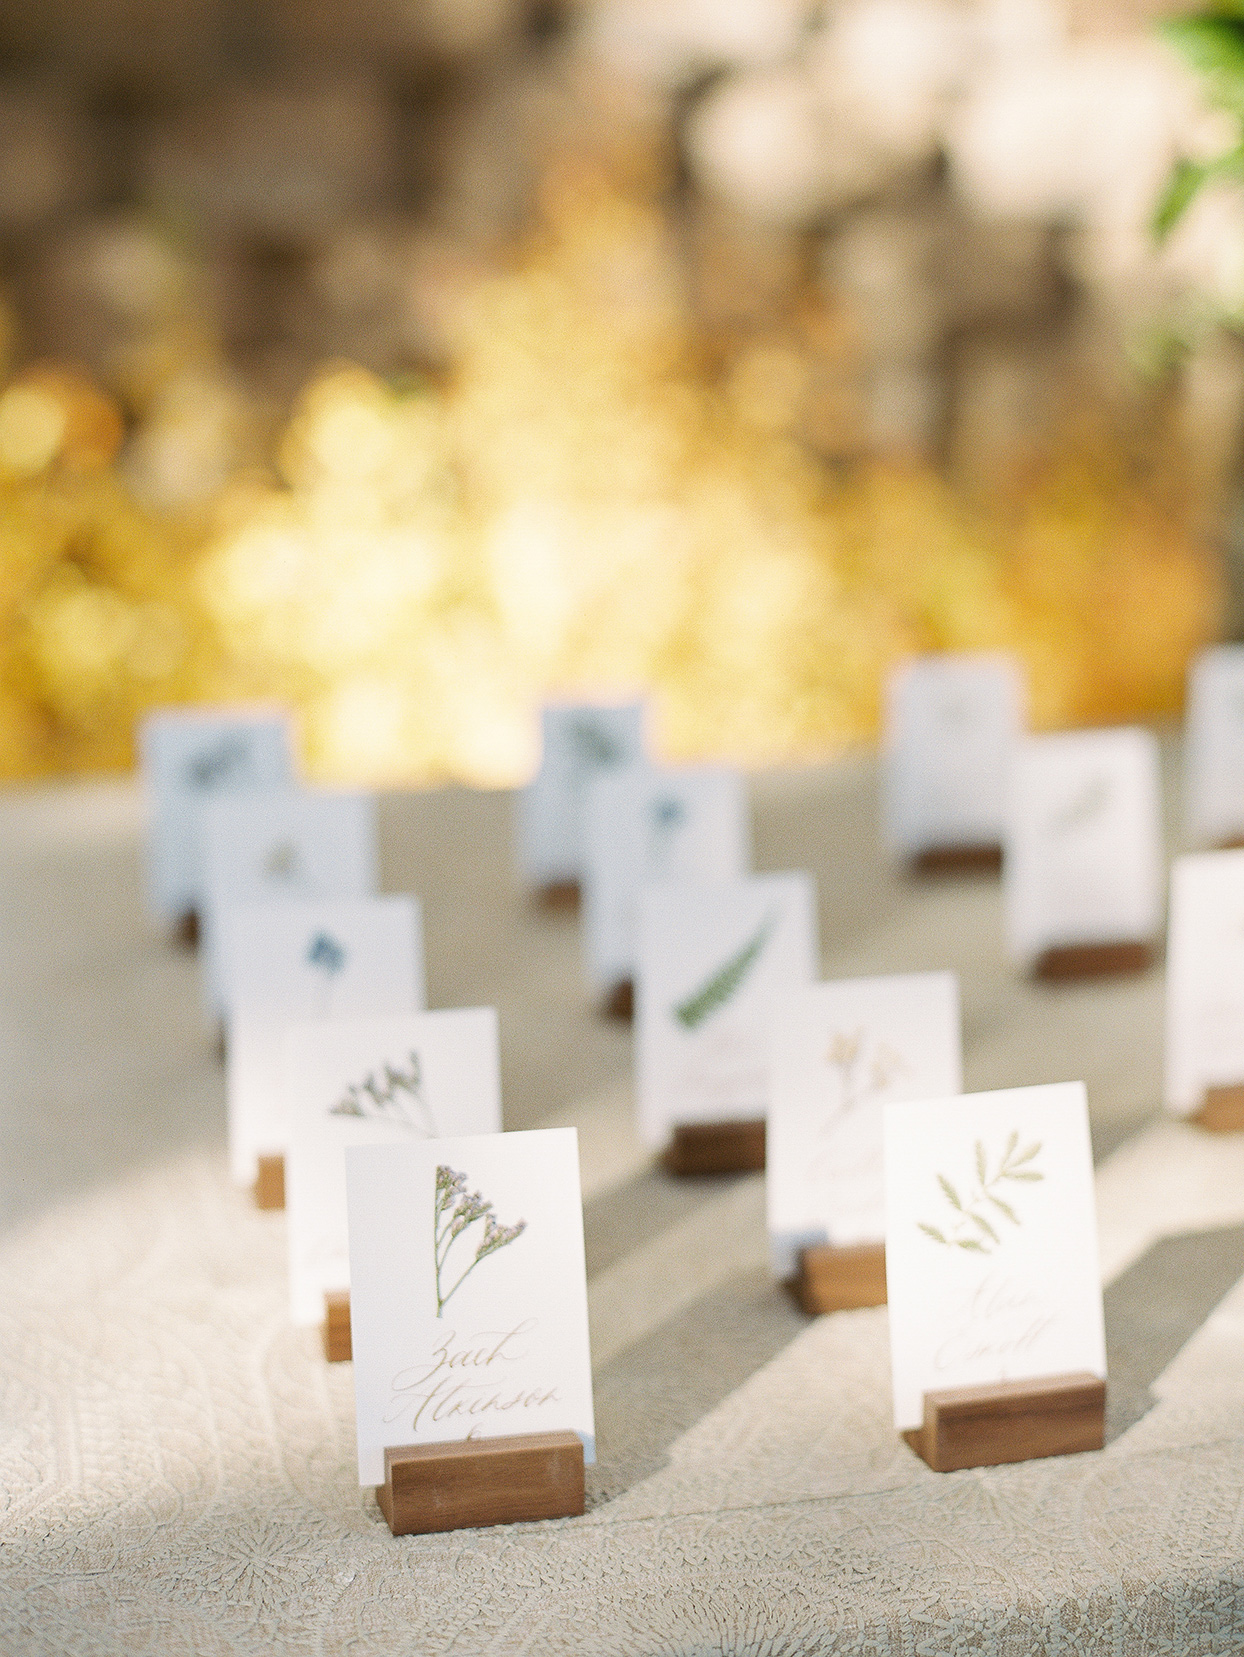 alexandra david wedding escort cards in wooden holders